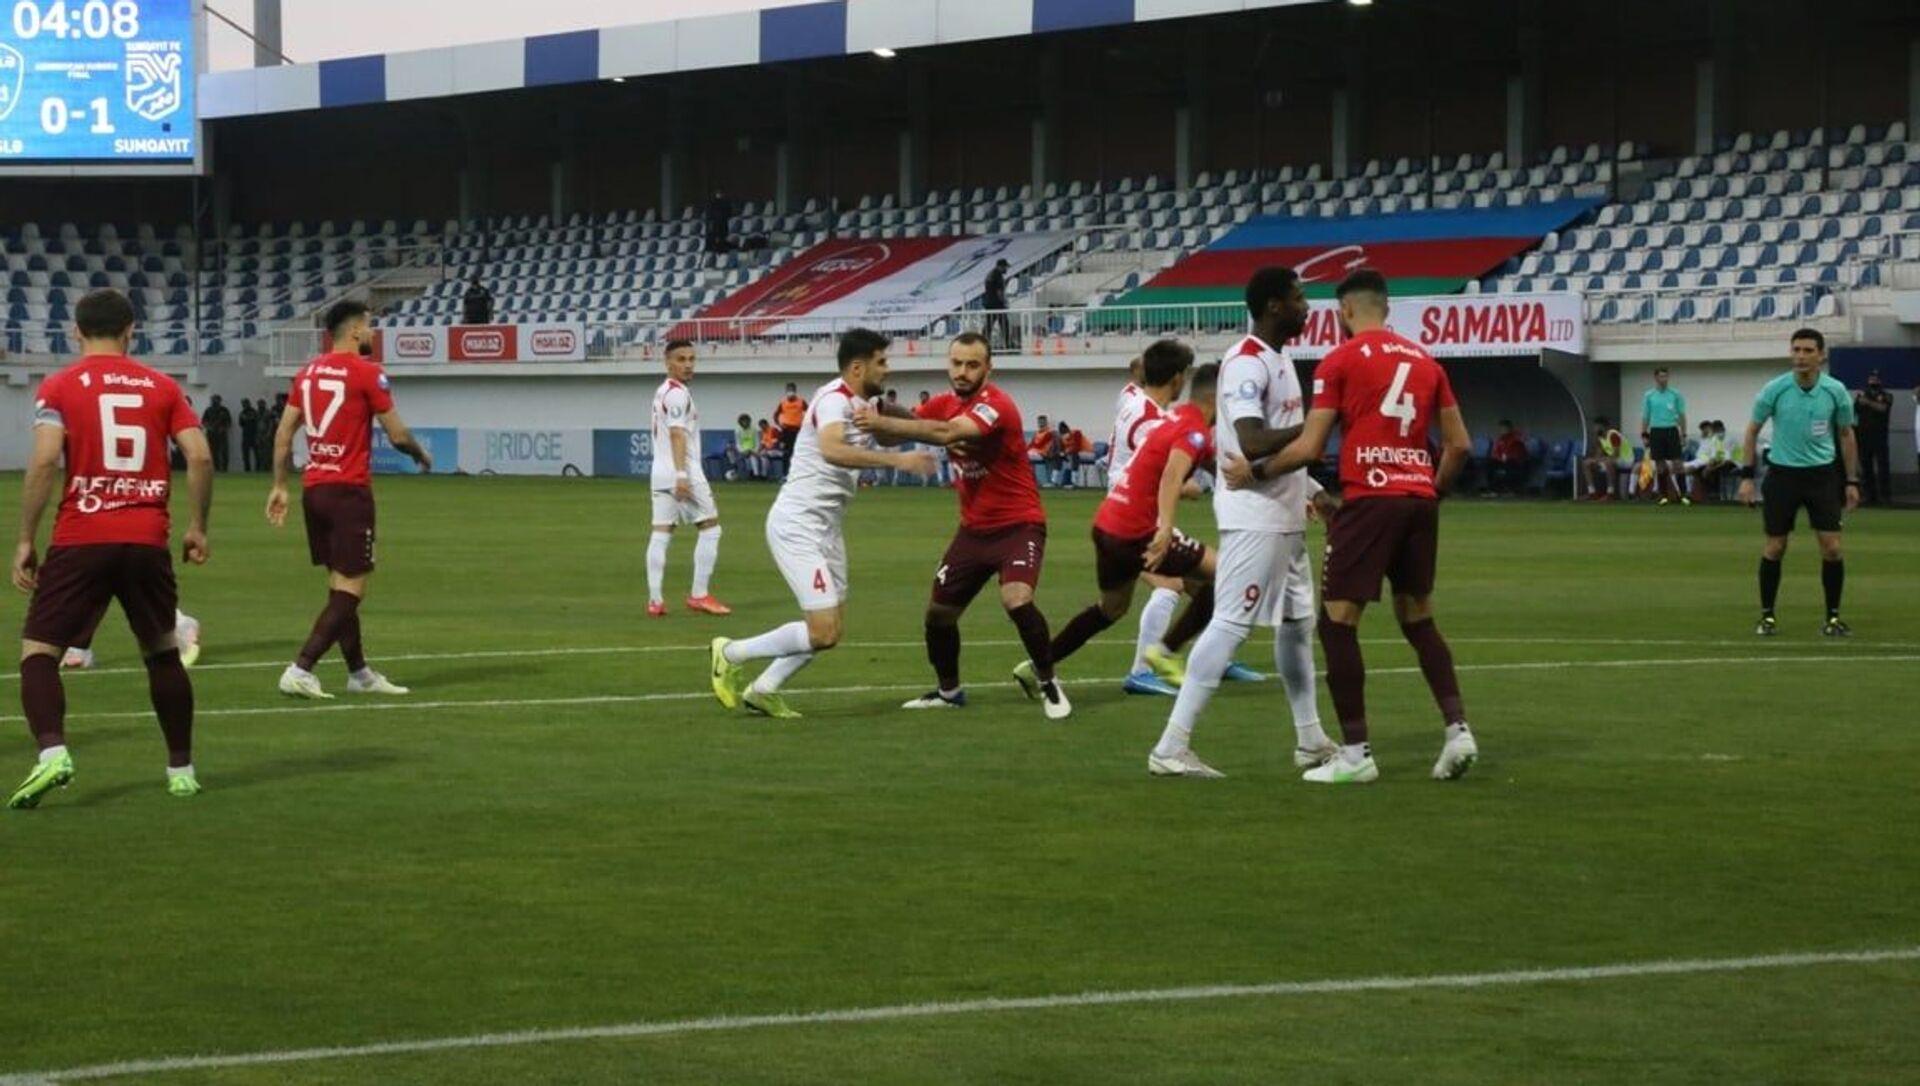 Финал Кубка Азербайджана по футболу, в котором бакинский Кешля одержал победу над Сумгайытом - Sputnik Азербайджан, 1920, 24.05.2021